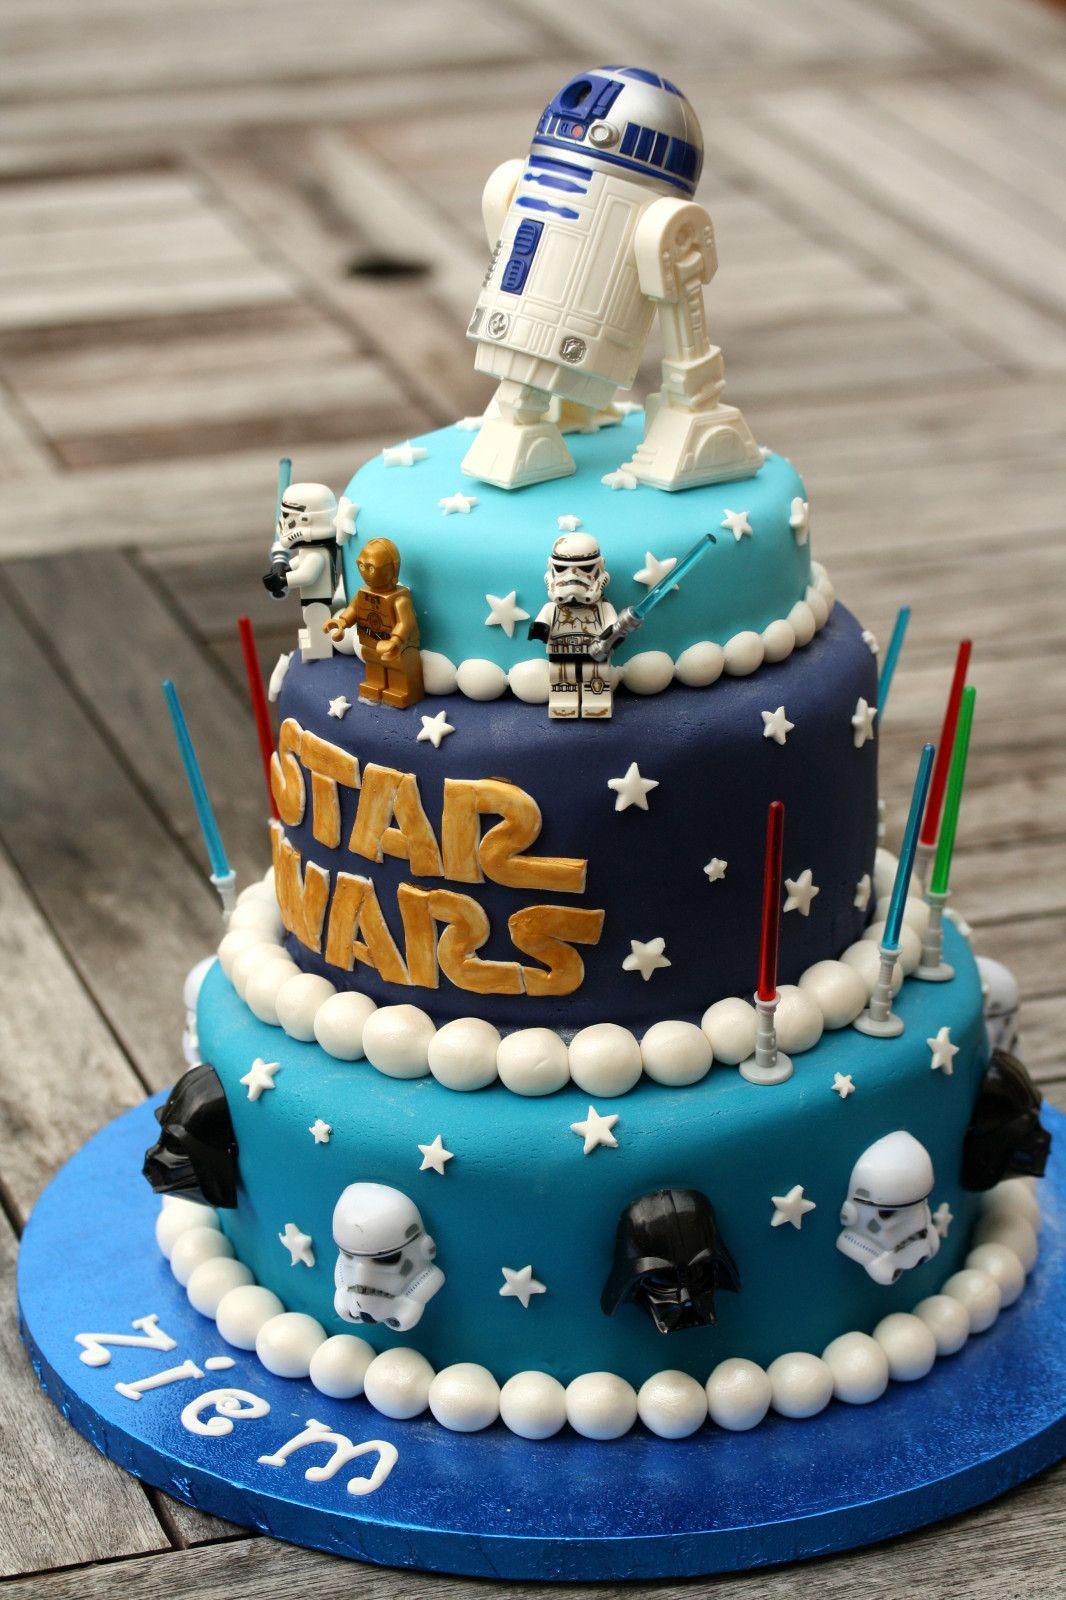 Bildergebnis Fur Diy Star Wars Cake R2 D2 Star Wars Cake Cake